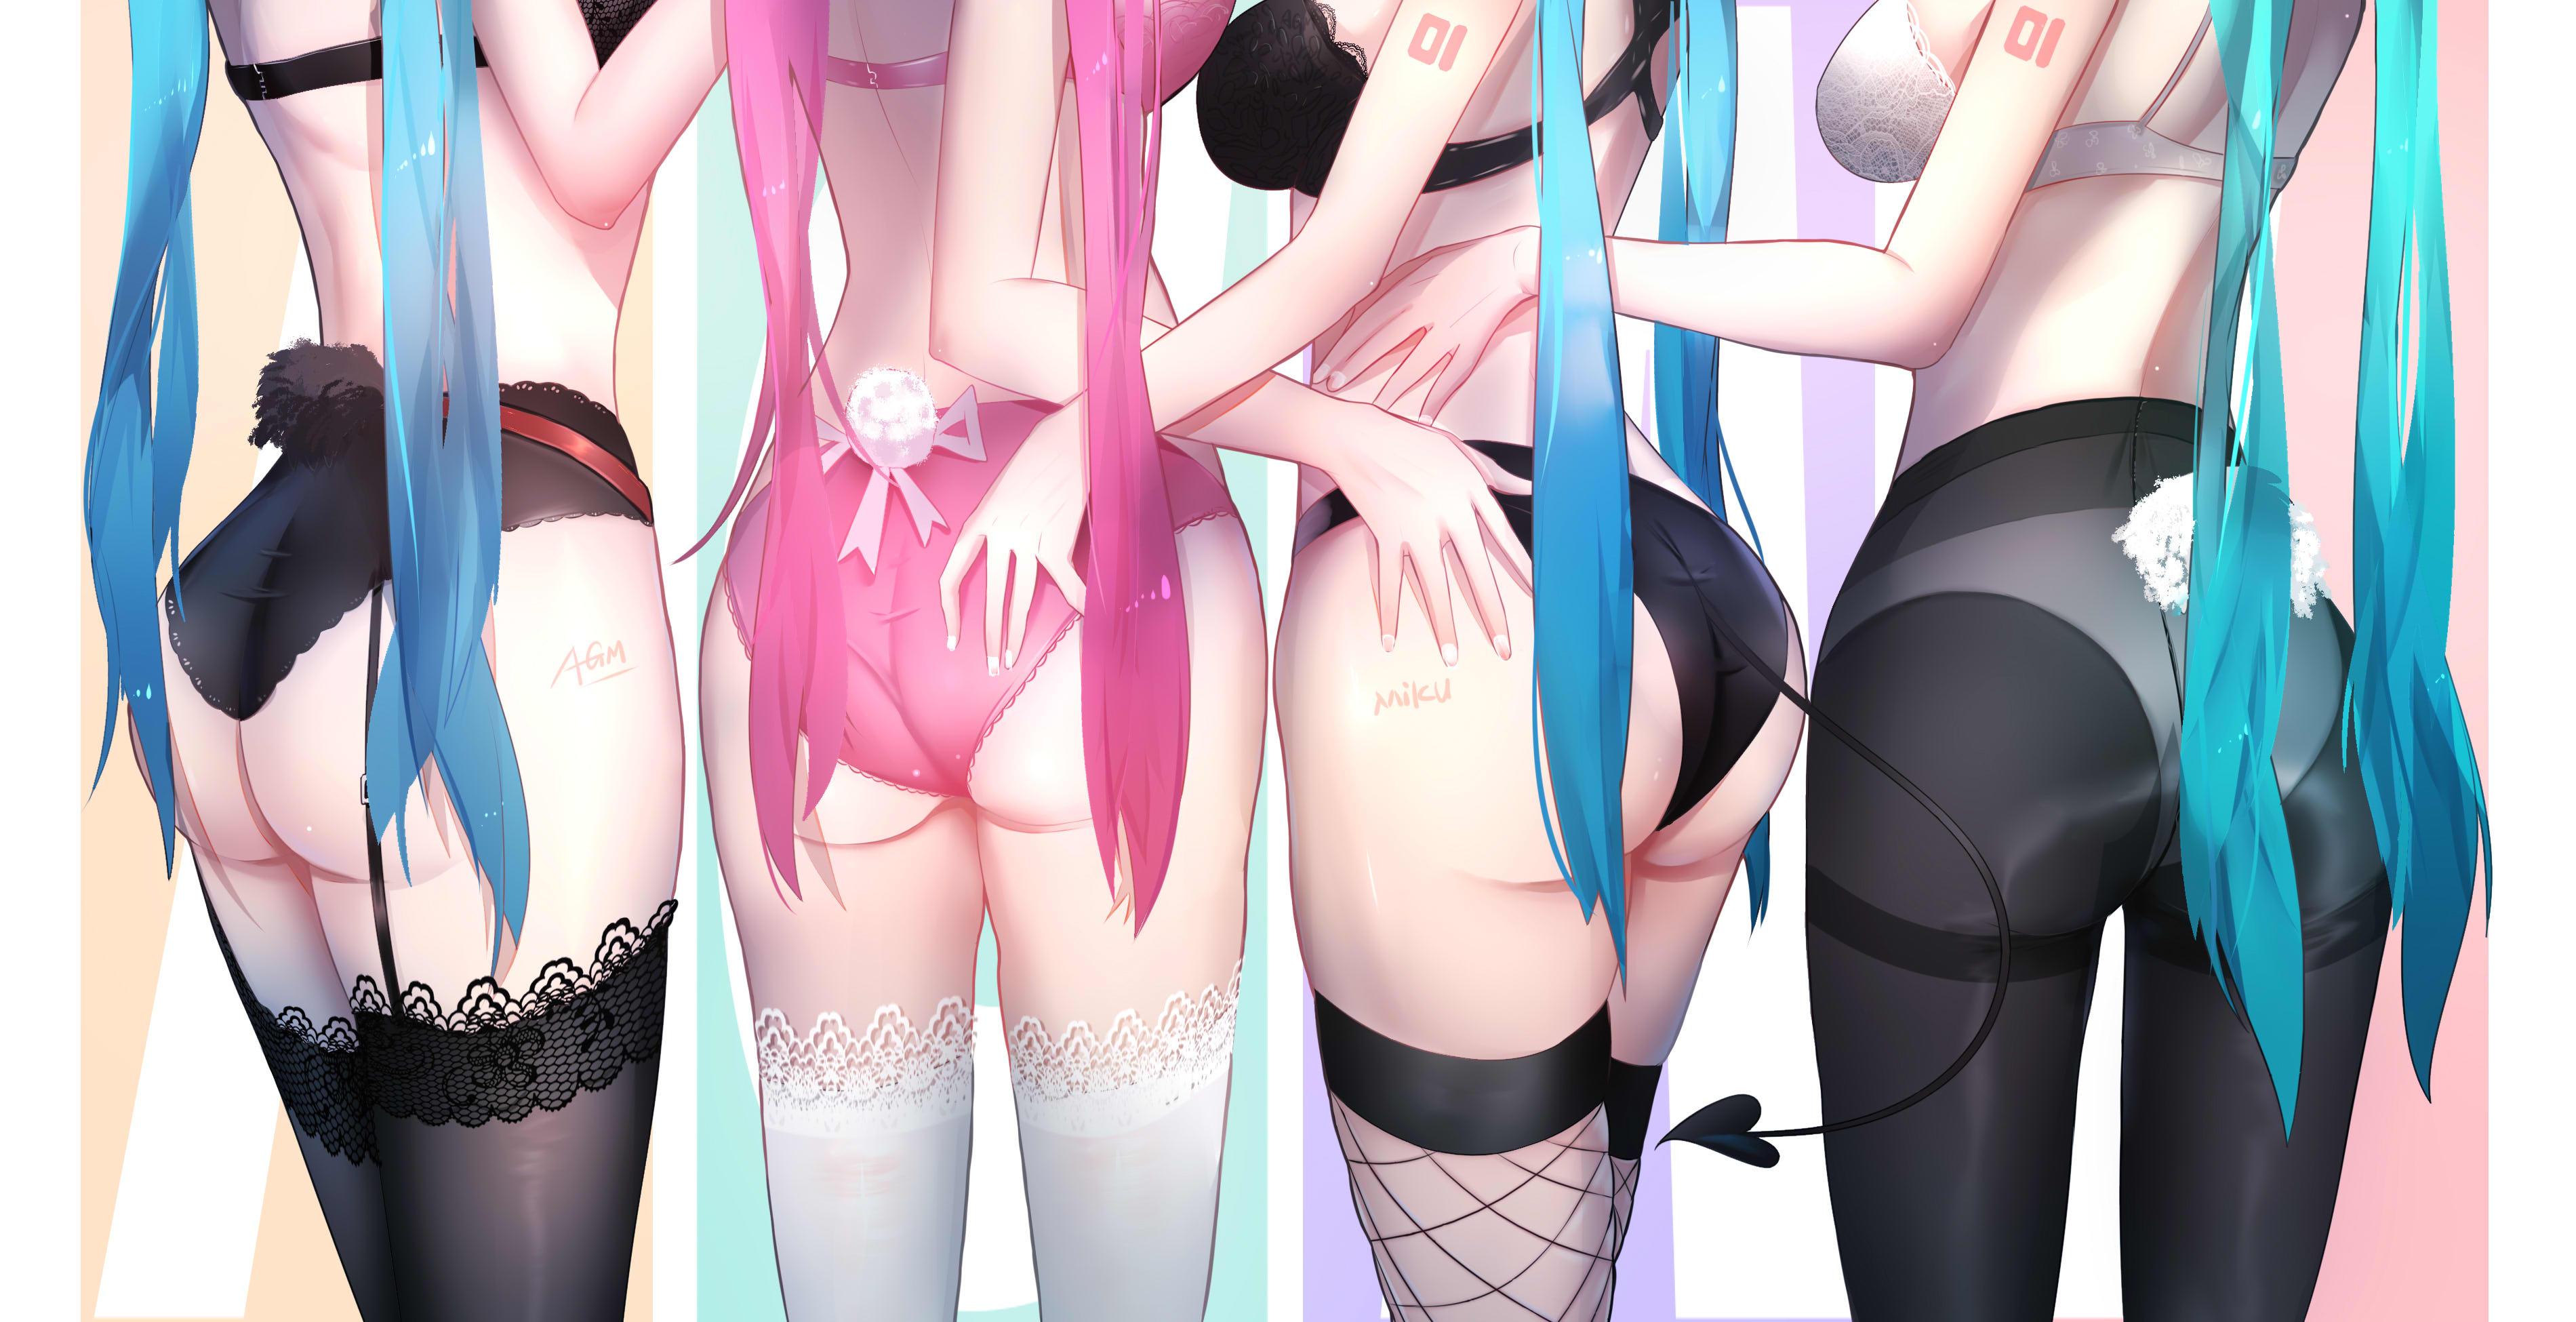 Anime 3800x1950 anime anime girls digital art artwork 2D portrait Hatsune Miku Vocaloid ass stockings Asses lined up pantyhose underwear twintails Omone Hokoma Agm